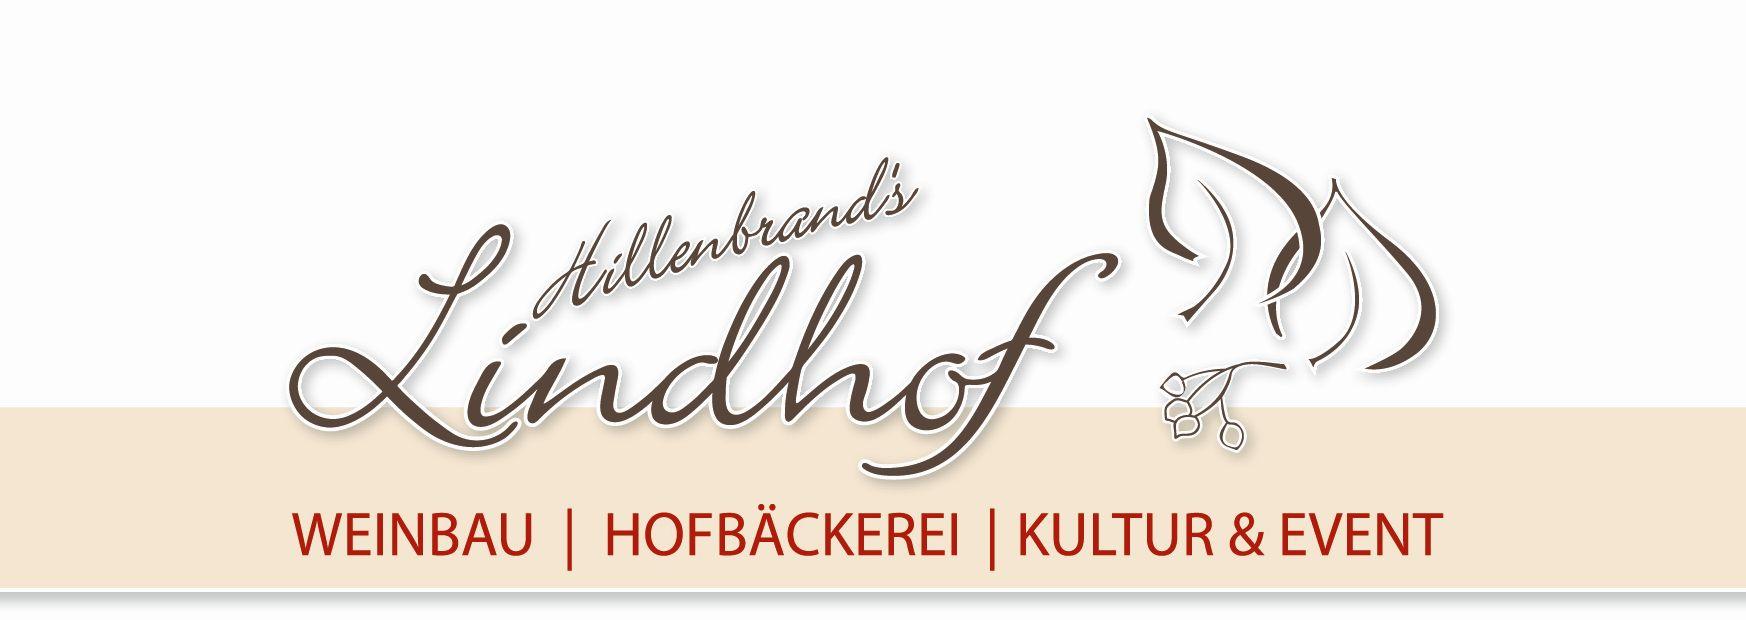 Weinbau - Hofbäckerei - Kultur u. Event